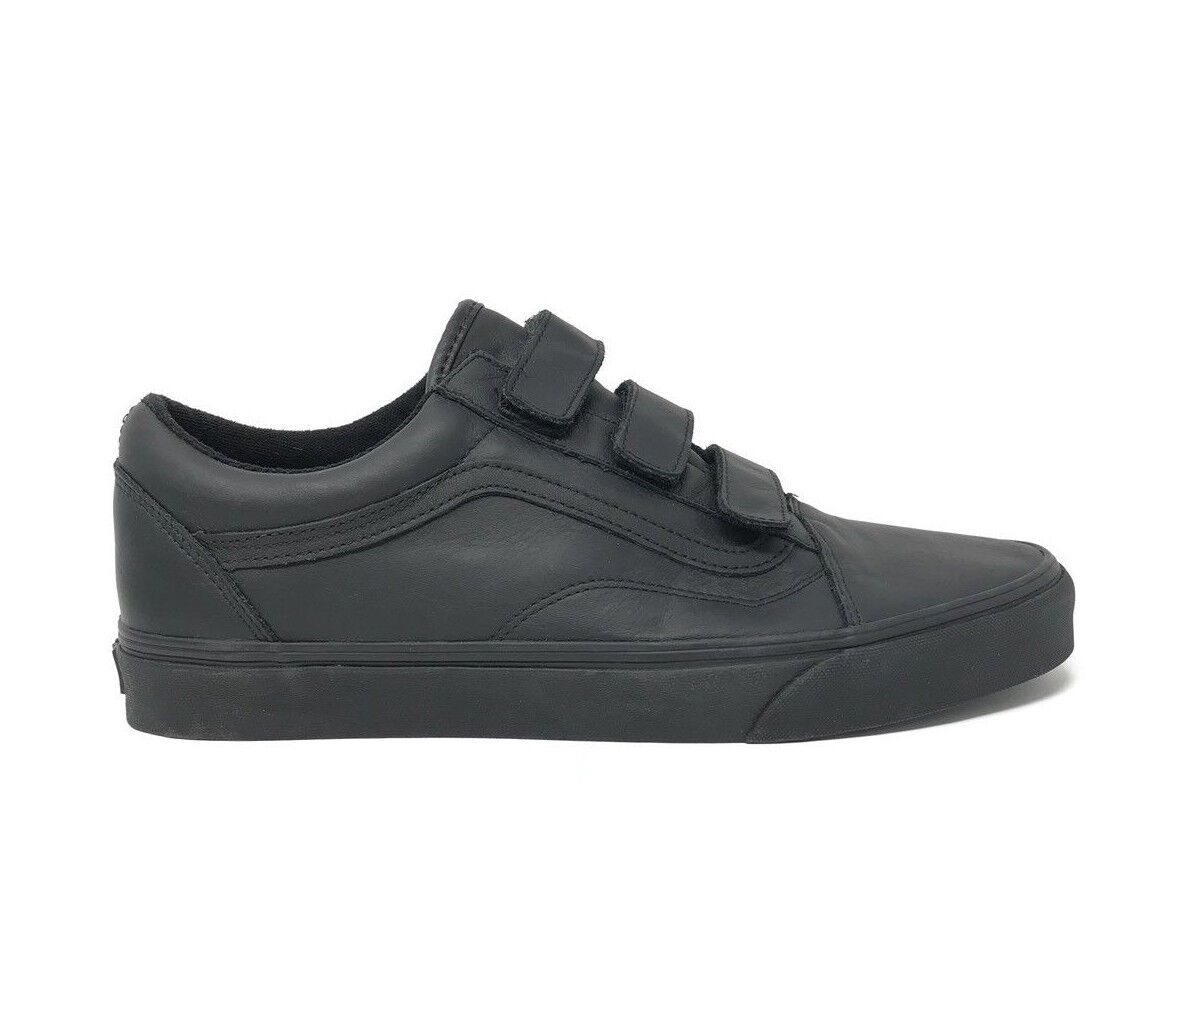 Vans Old Skool V Mono Leather Black Men's 9.5 Skate Shoes New Skateboard